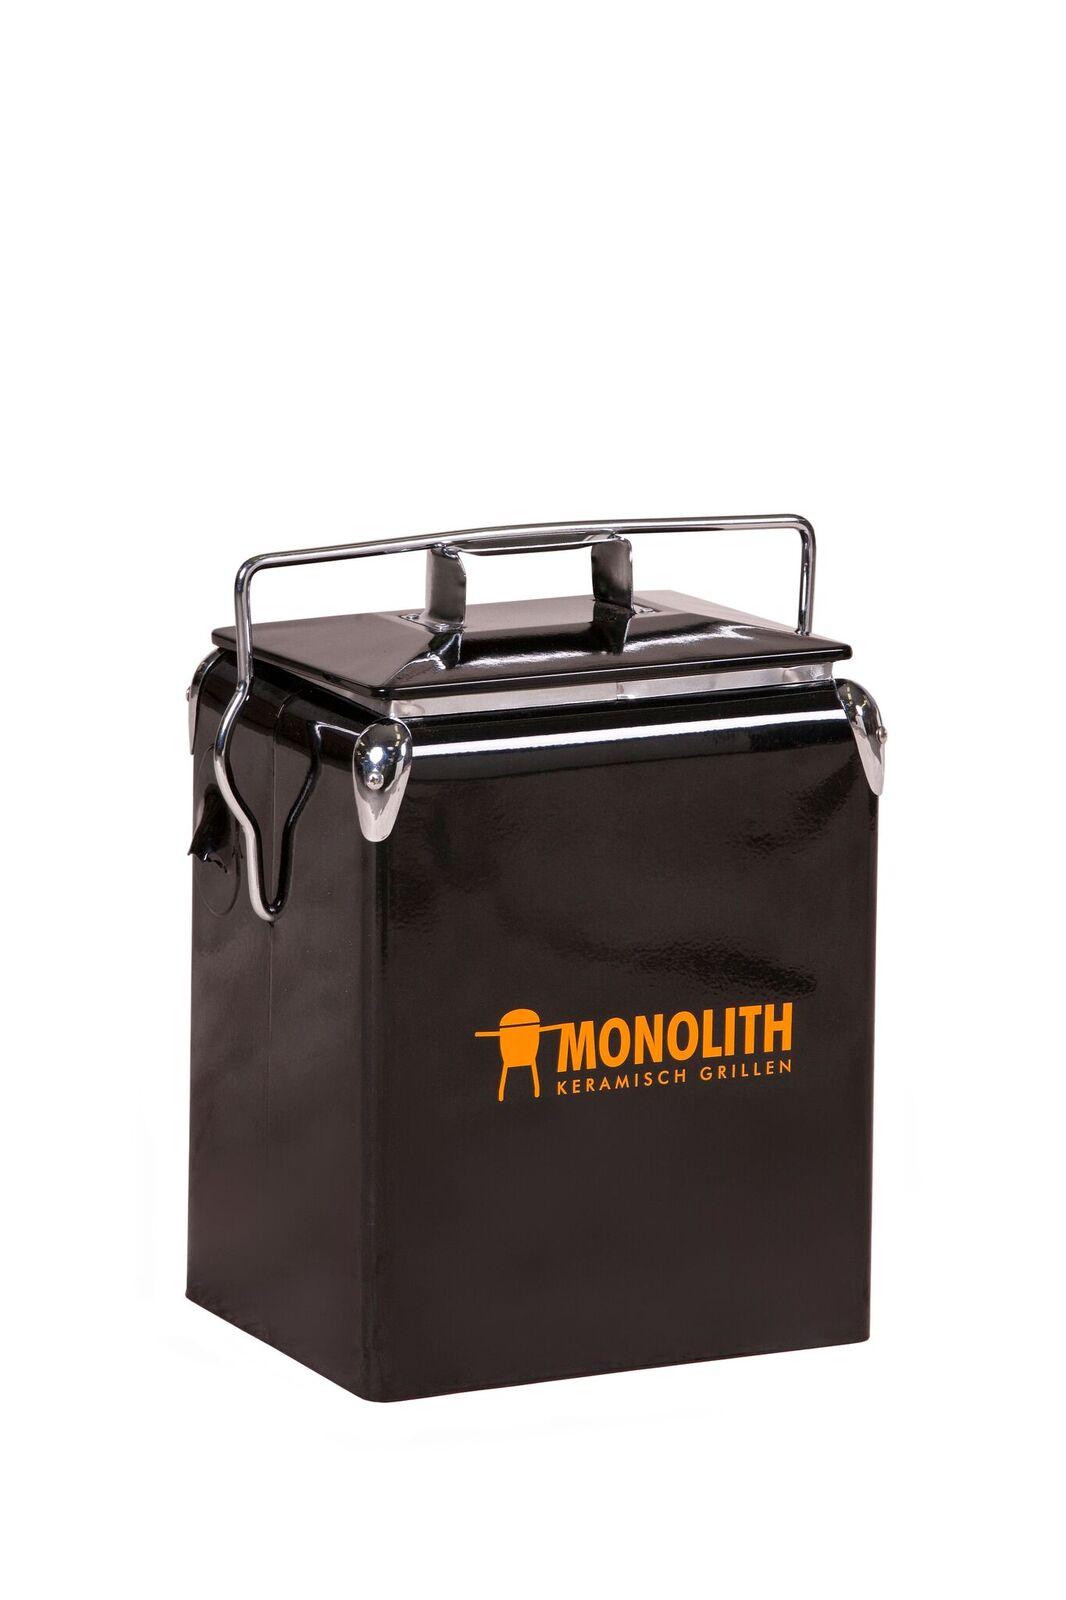 17 litre portable Monolith cool box